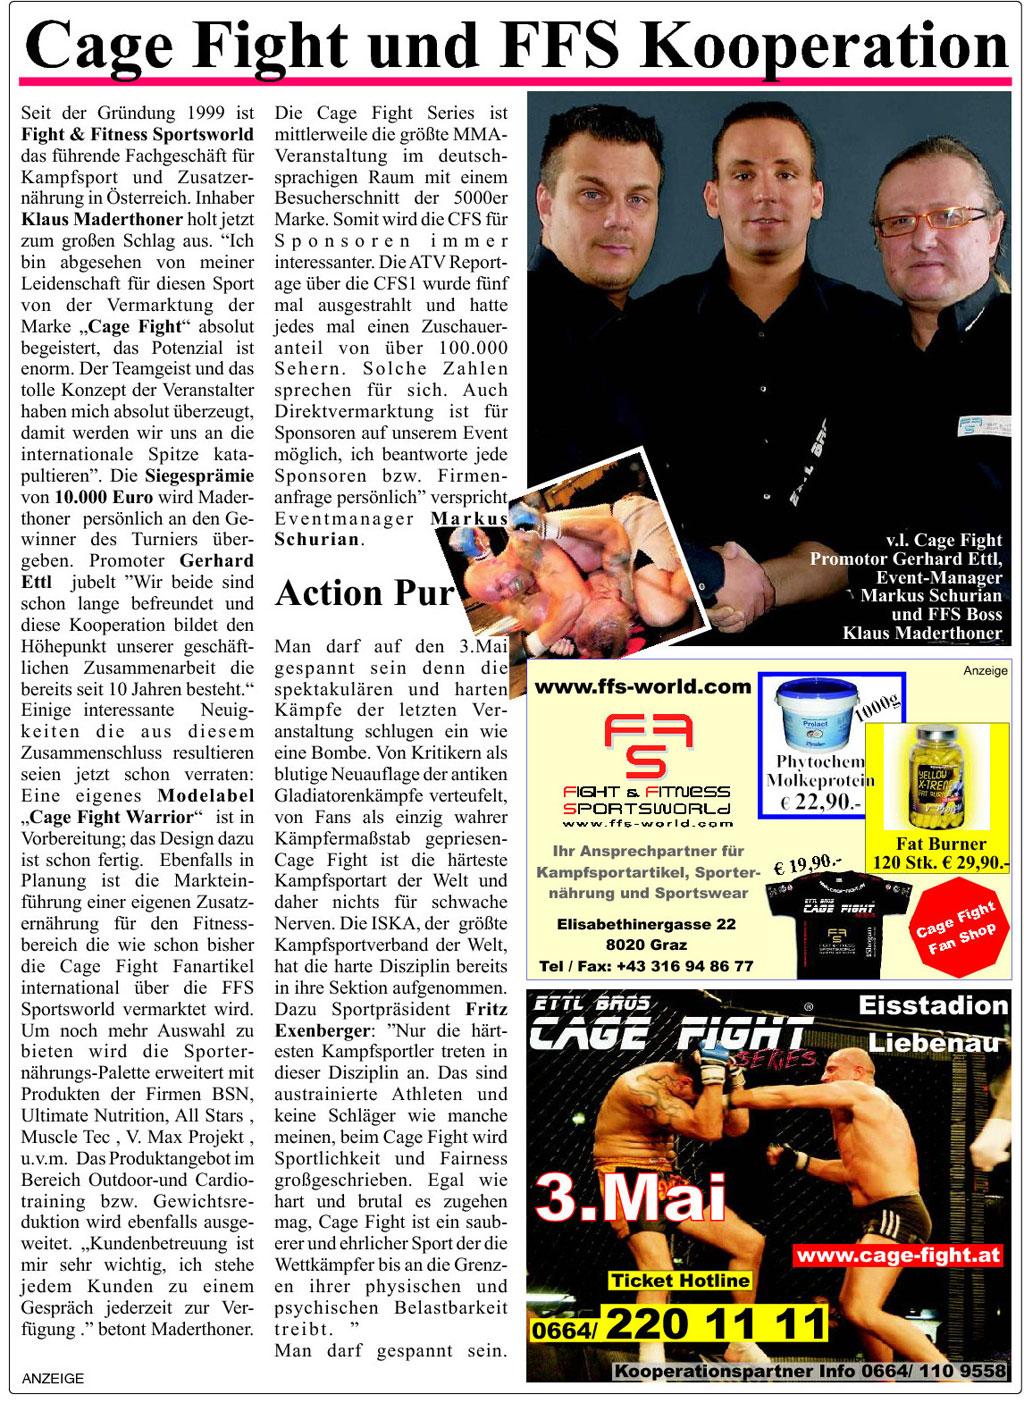 Der Grazer 06.April 2008